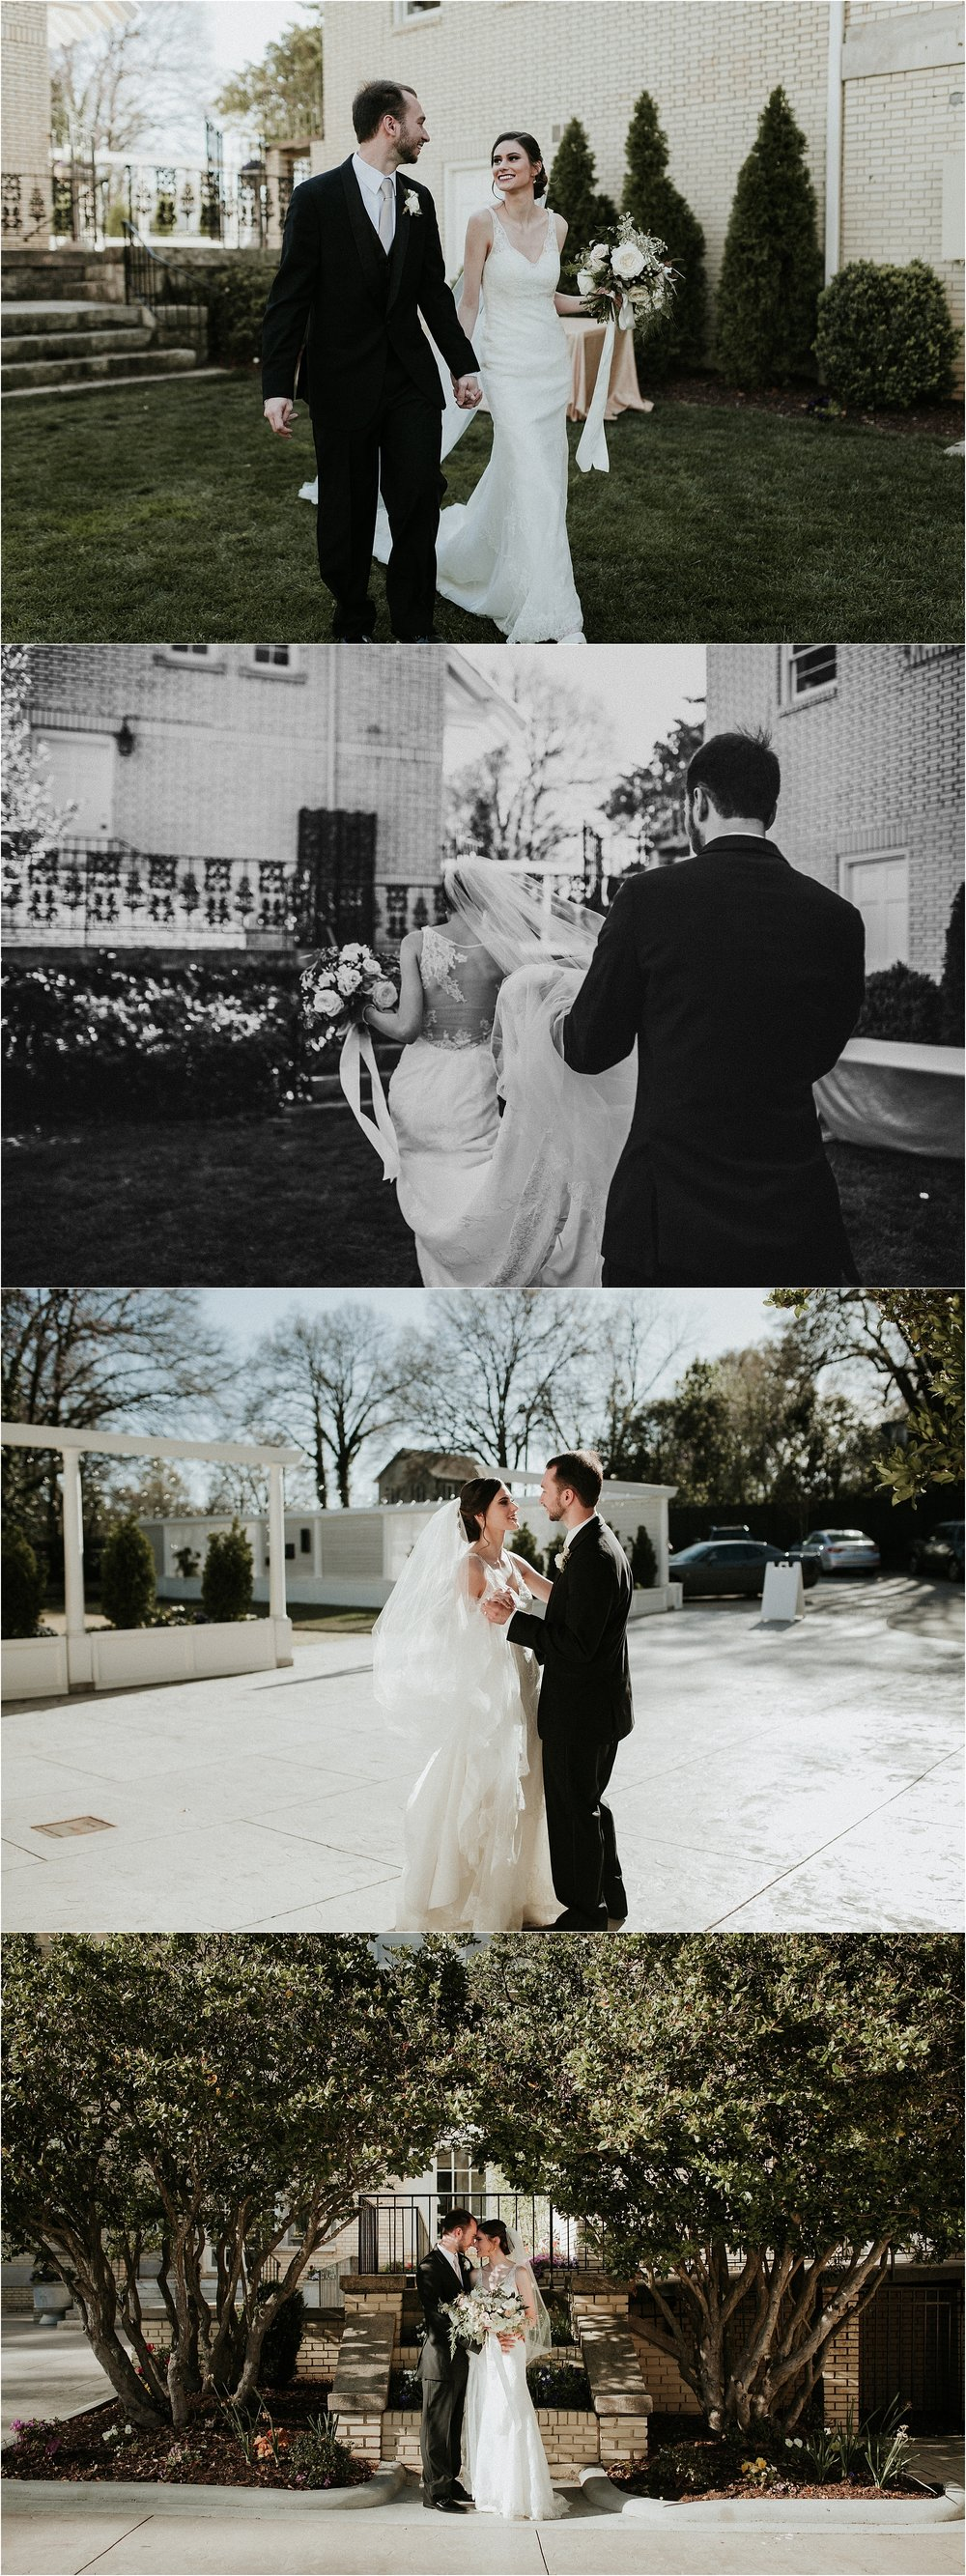 separk-mansion-gastonia-nc-wedding-photographer496.jpg